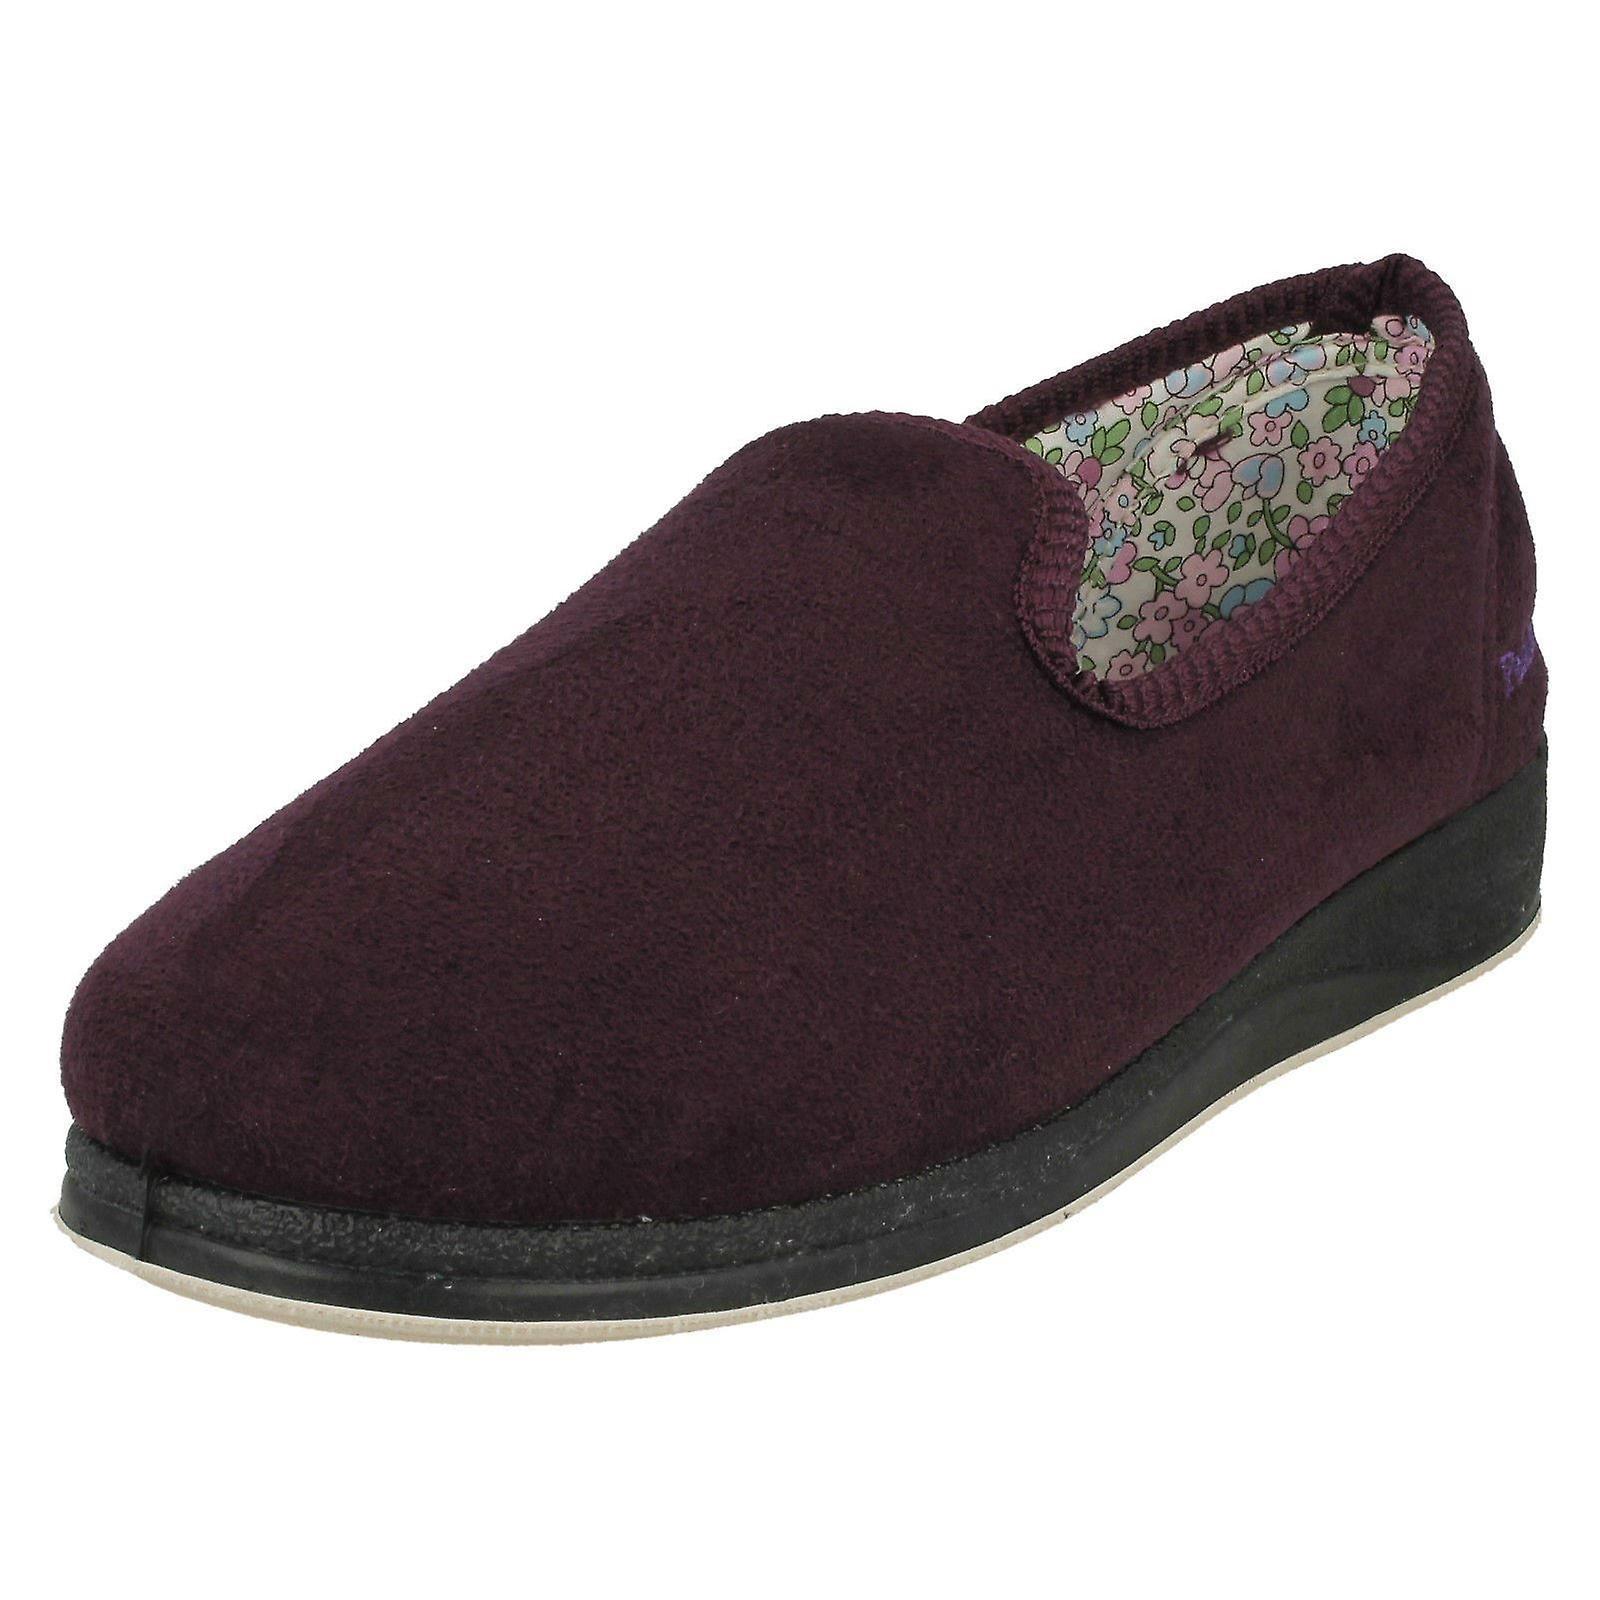 Ladies Padders Slip On Slipper Shoes Textile Repose 18 - Purple Textile Shoes - UK Size 4 2E - EU Size 37 - US Size 6 60725f